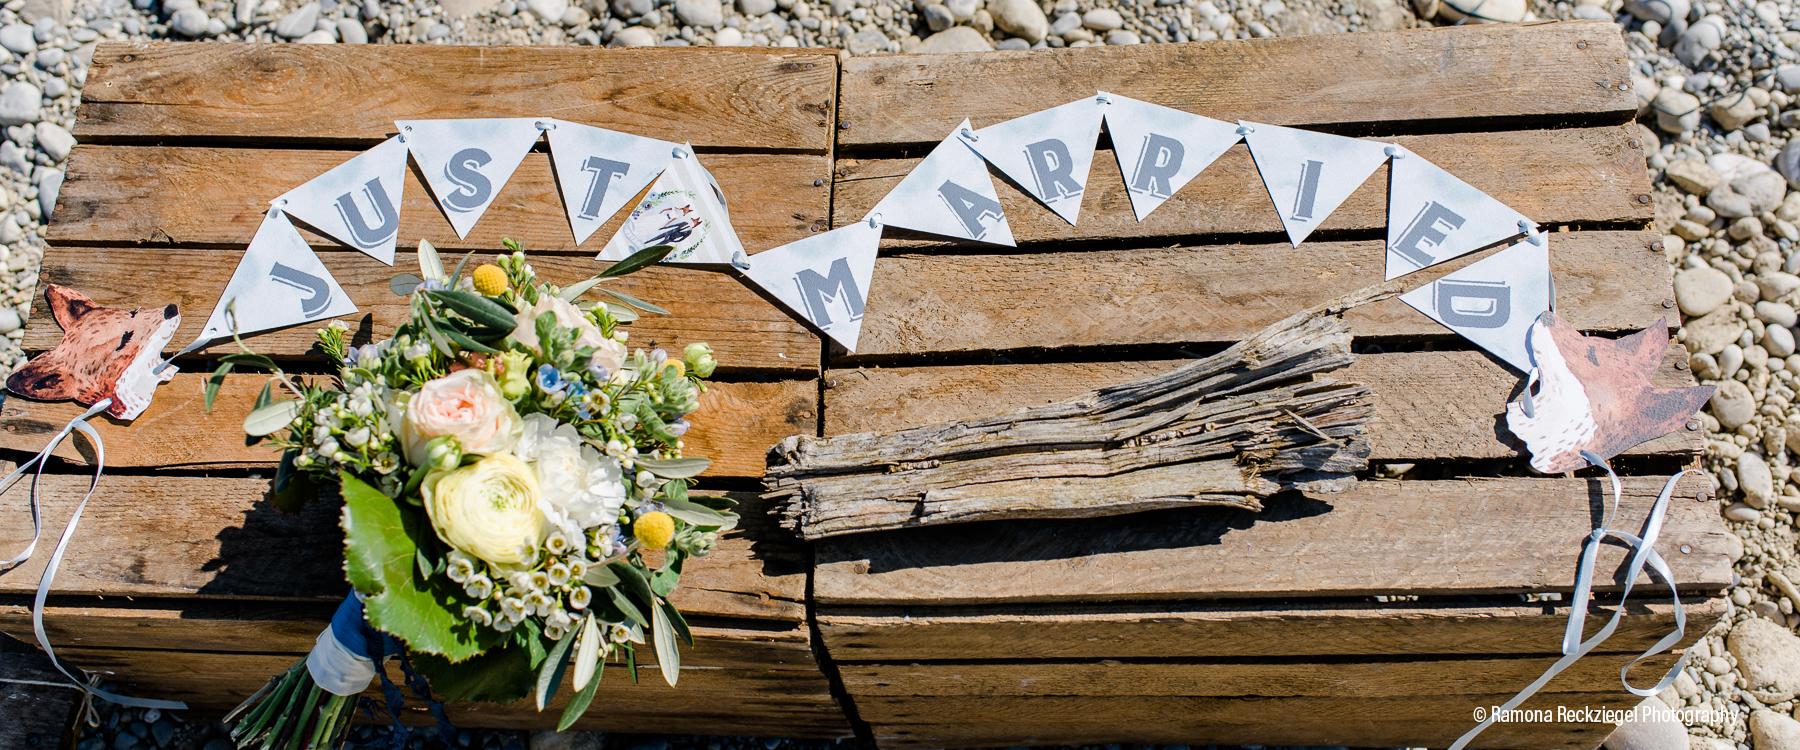 wedding-fotos-cinema-rrp-0761.jpg